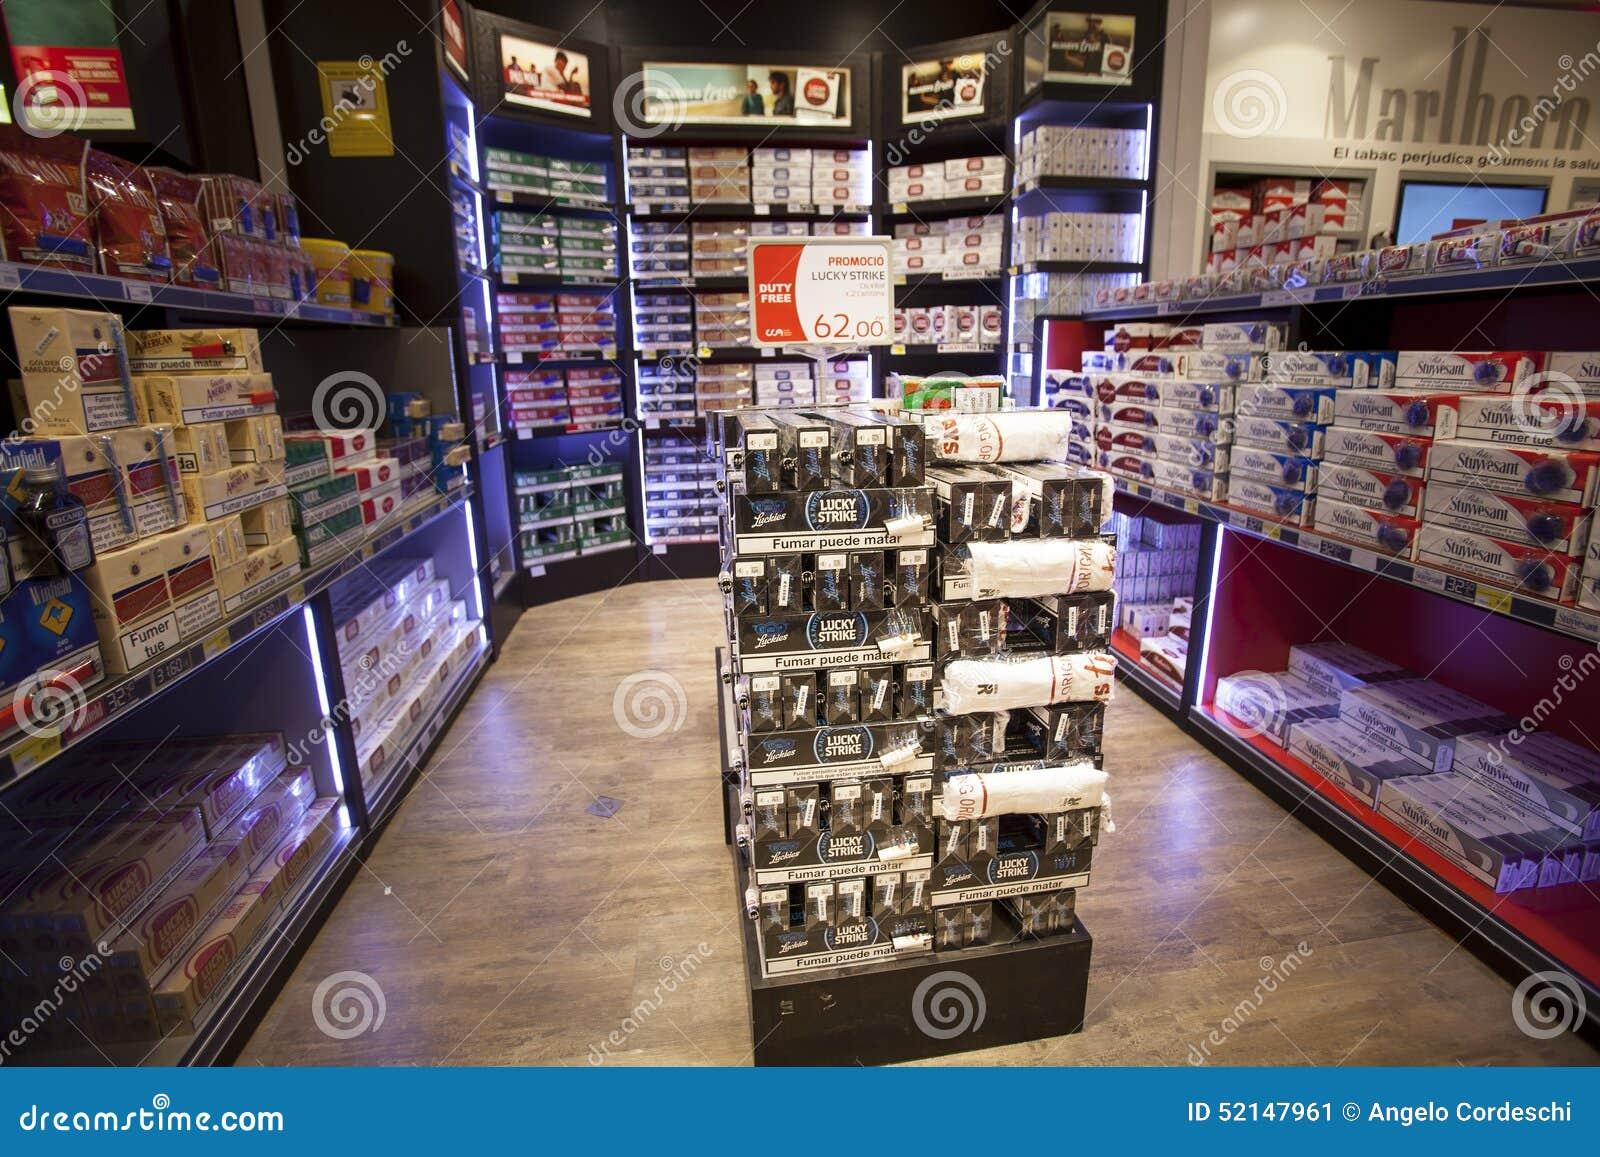 Cigarettes Store Shelves Store Editorial Photo Image